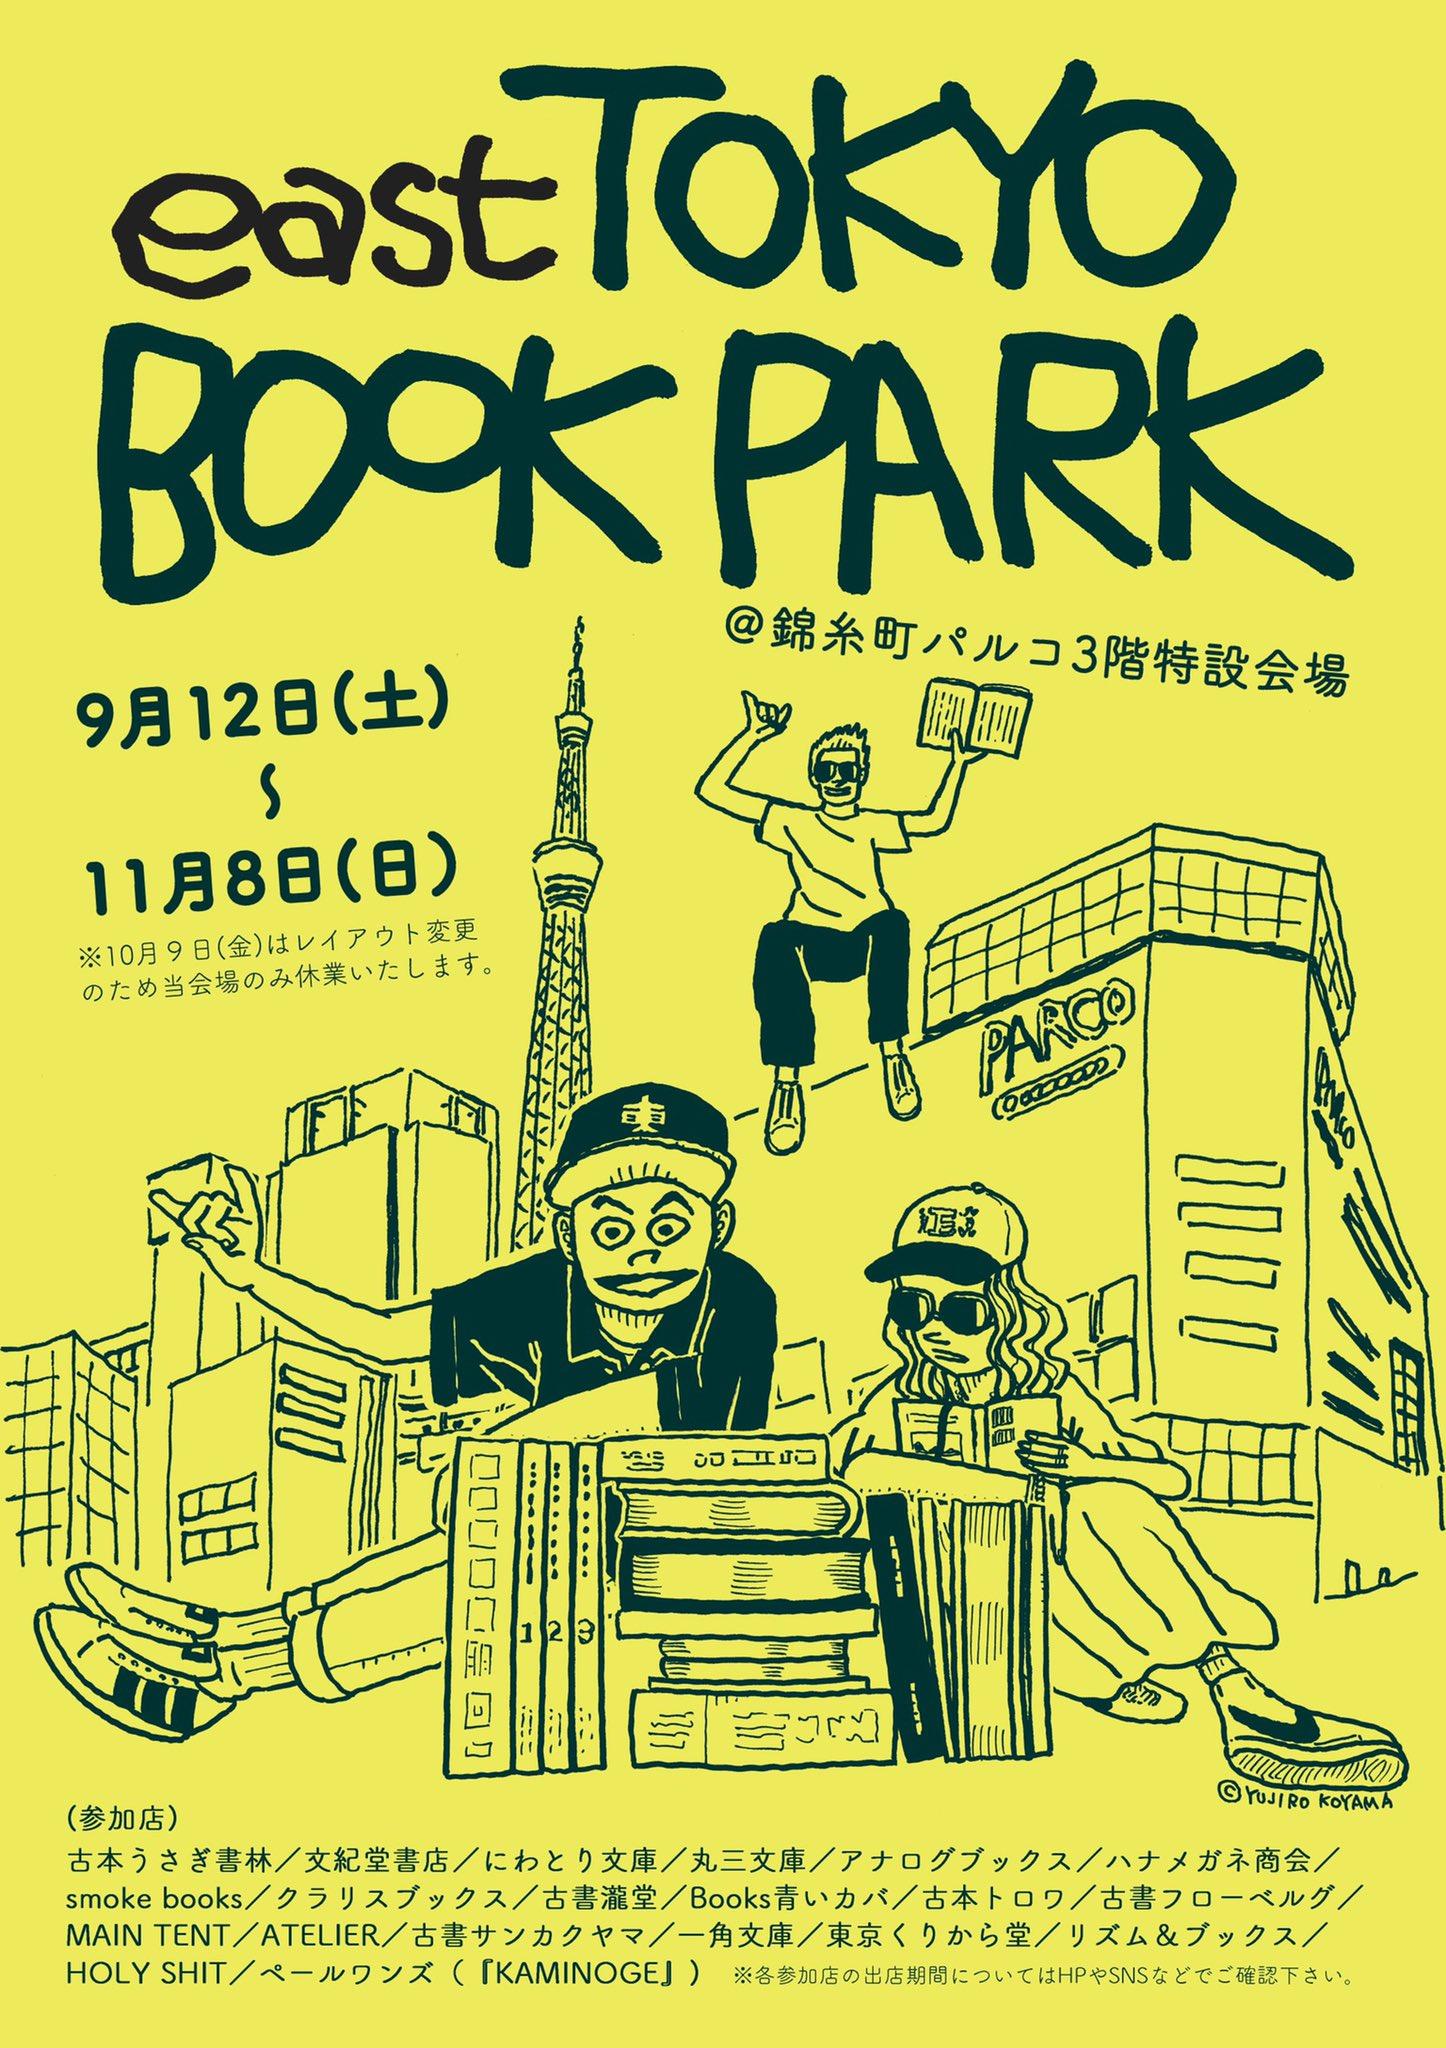 east TOKYO BOOK PARK